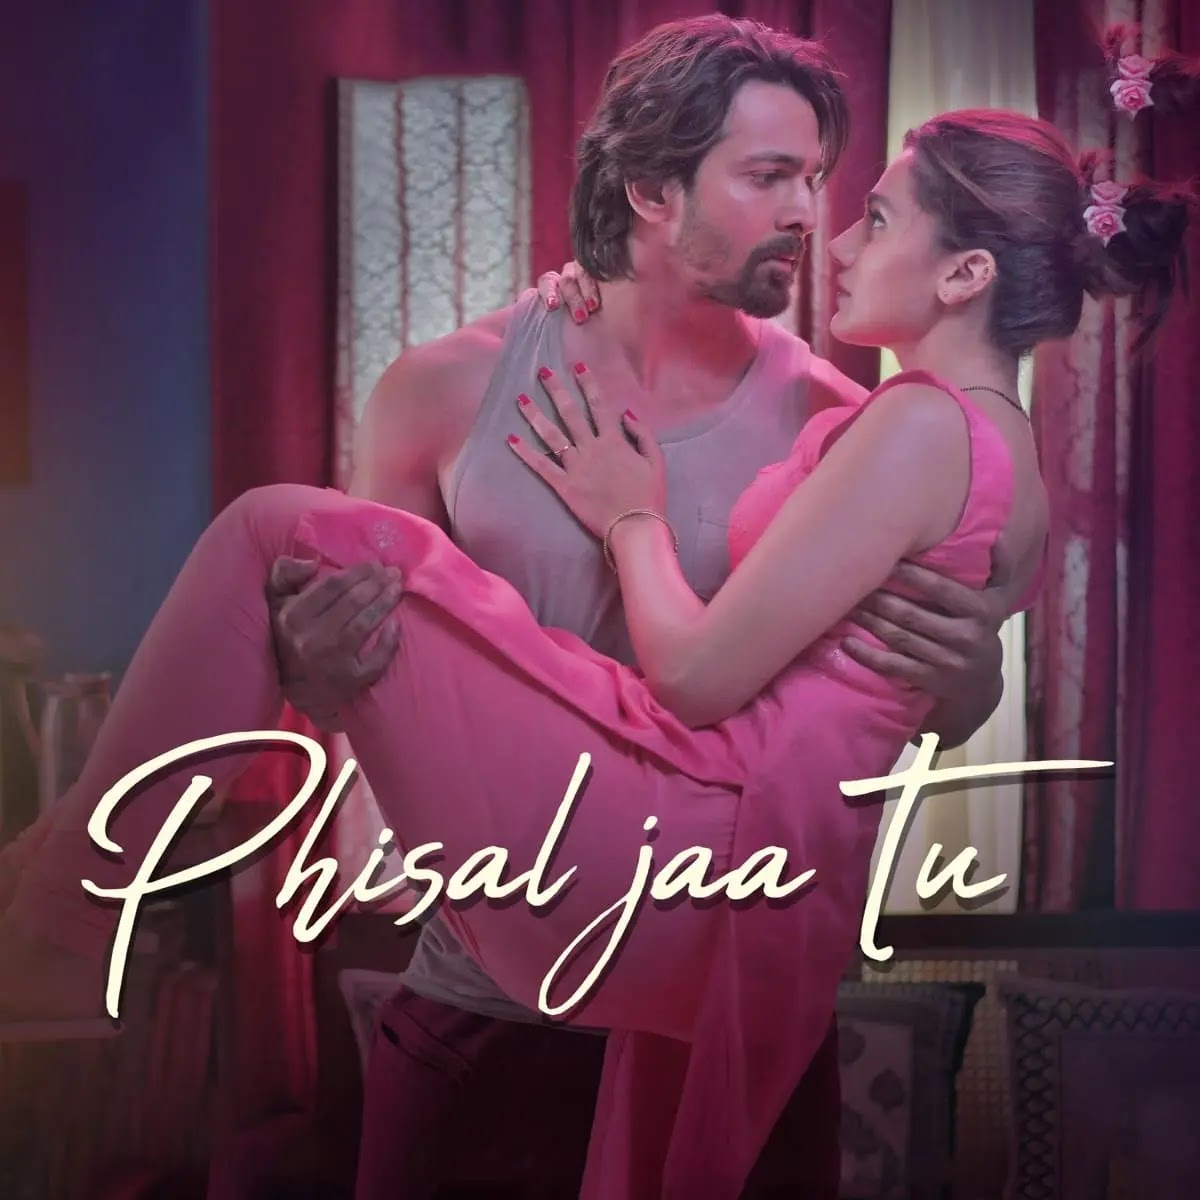 Phisal Jaa Tu Mp3 Song Download 320kbps Free